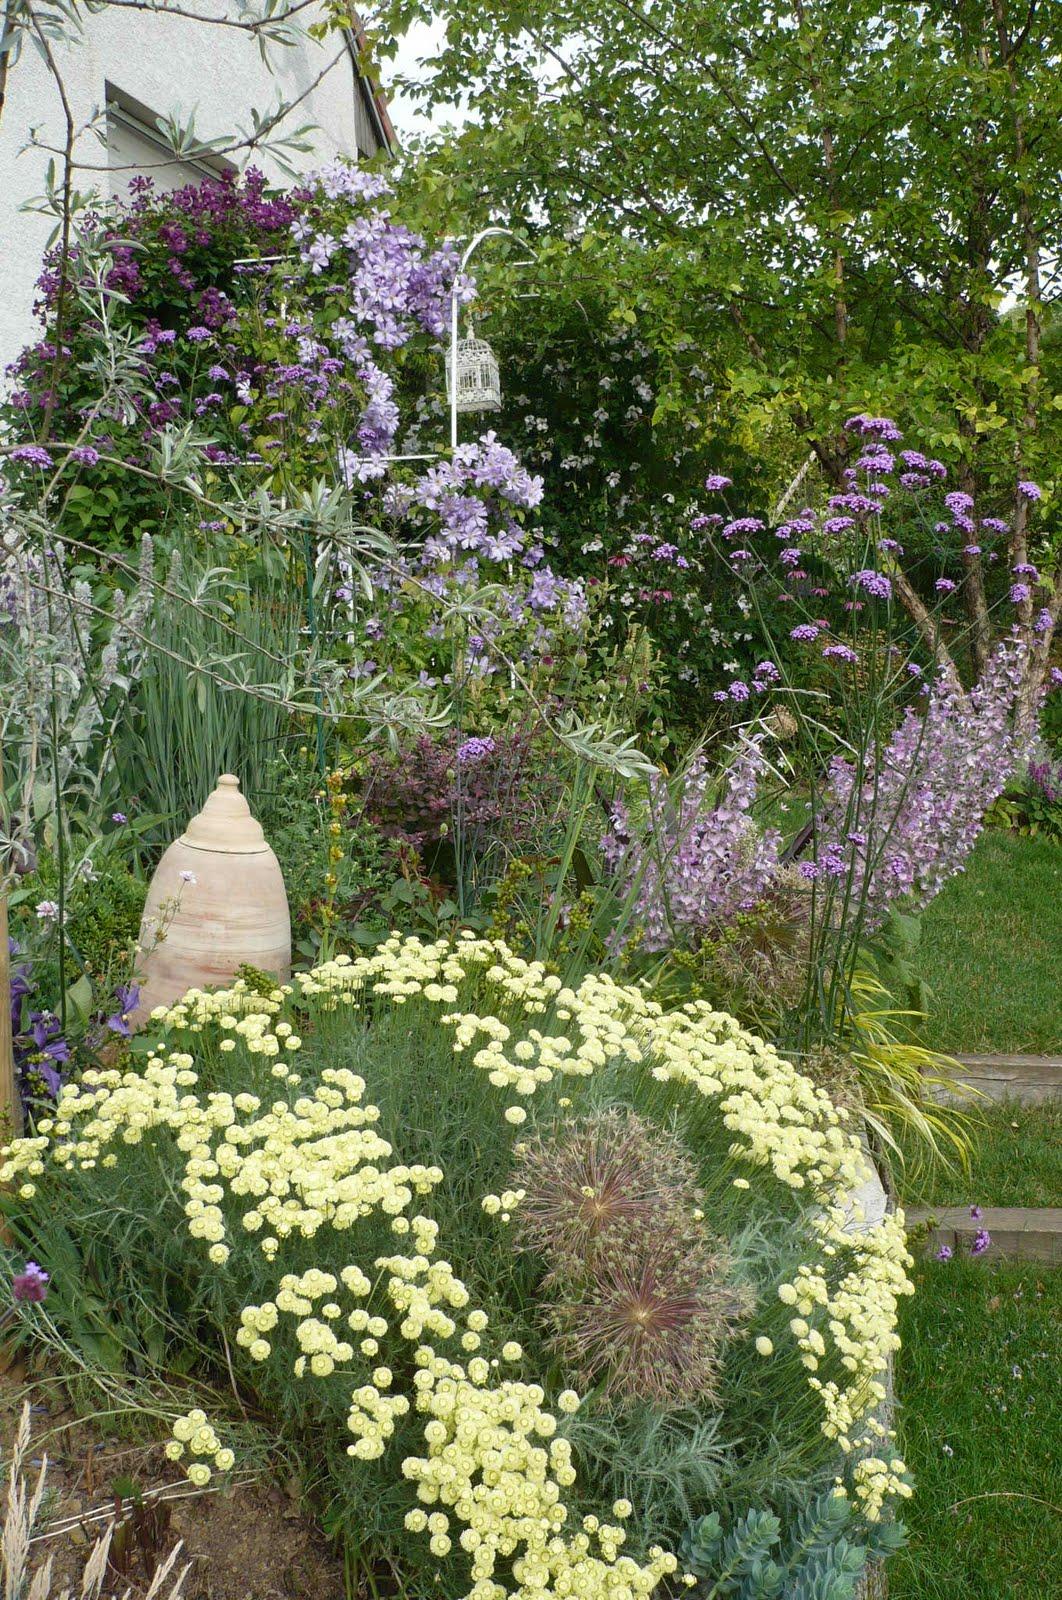 Le jardin des grandes vignes promenade au jardin et devinette - Le jardin des grandes vignes ...